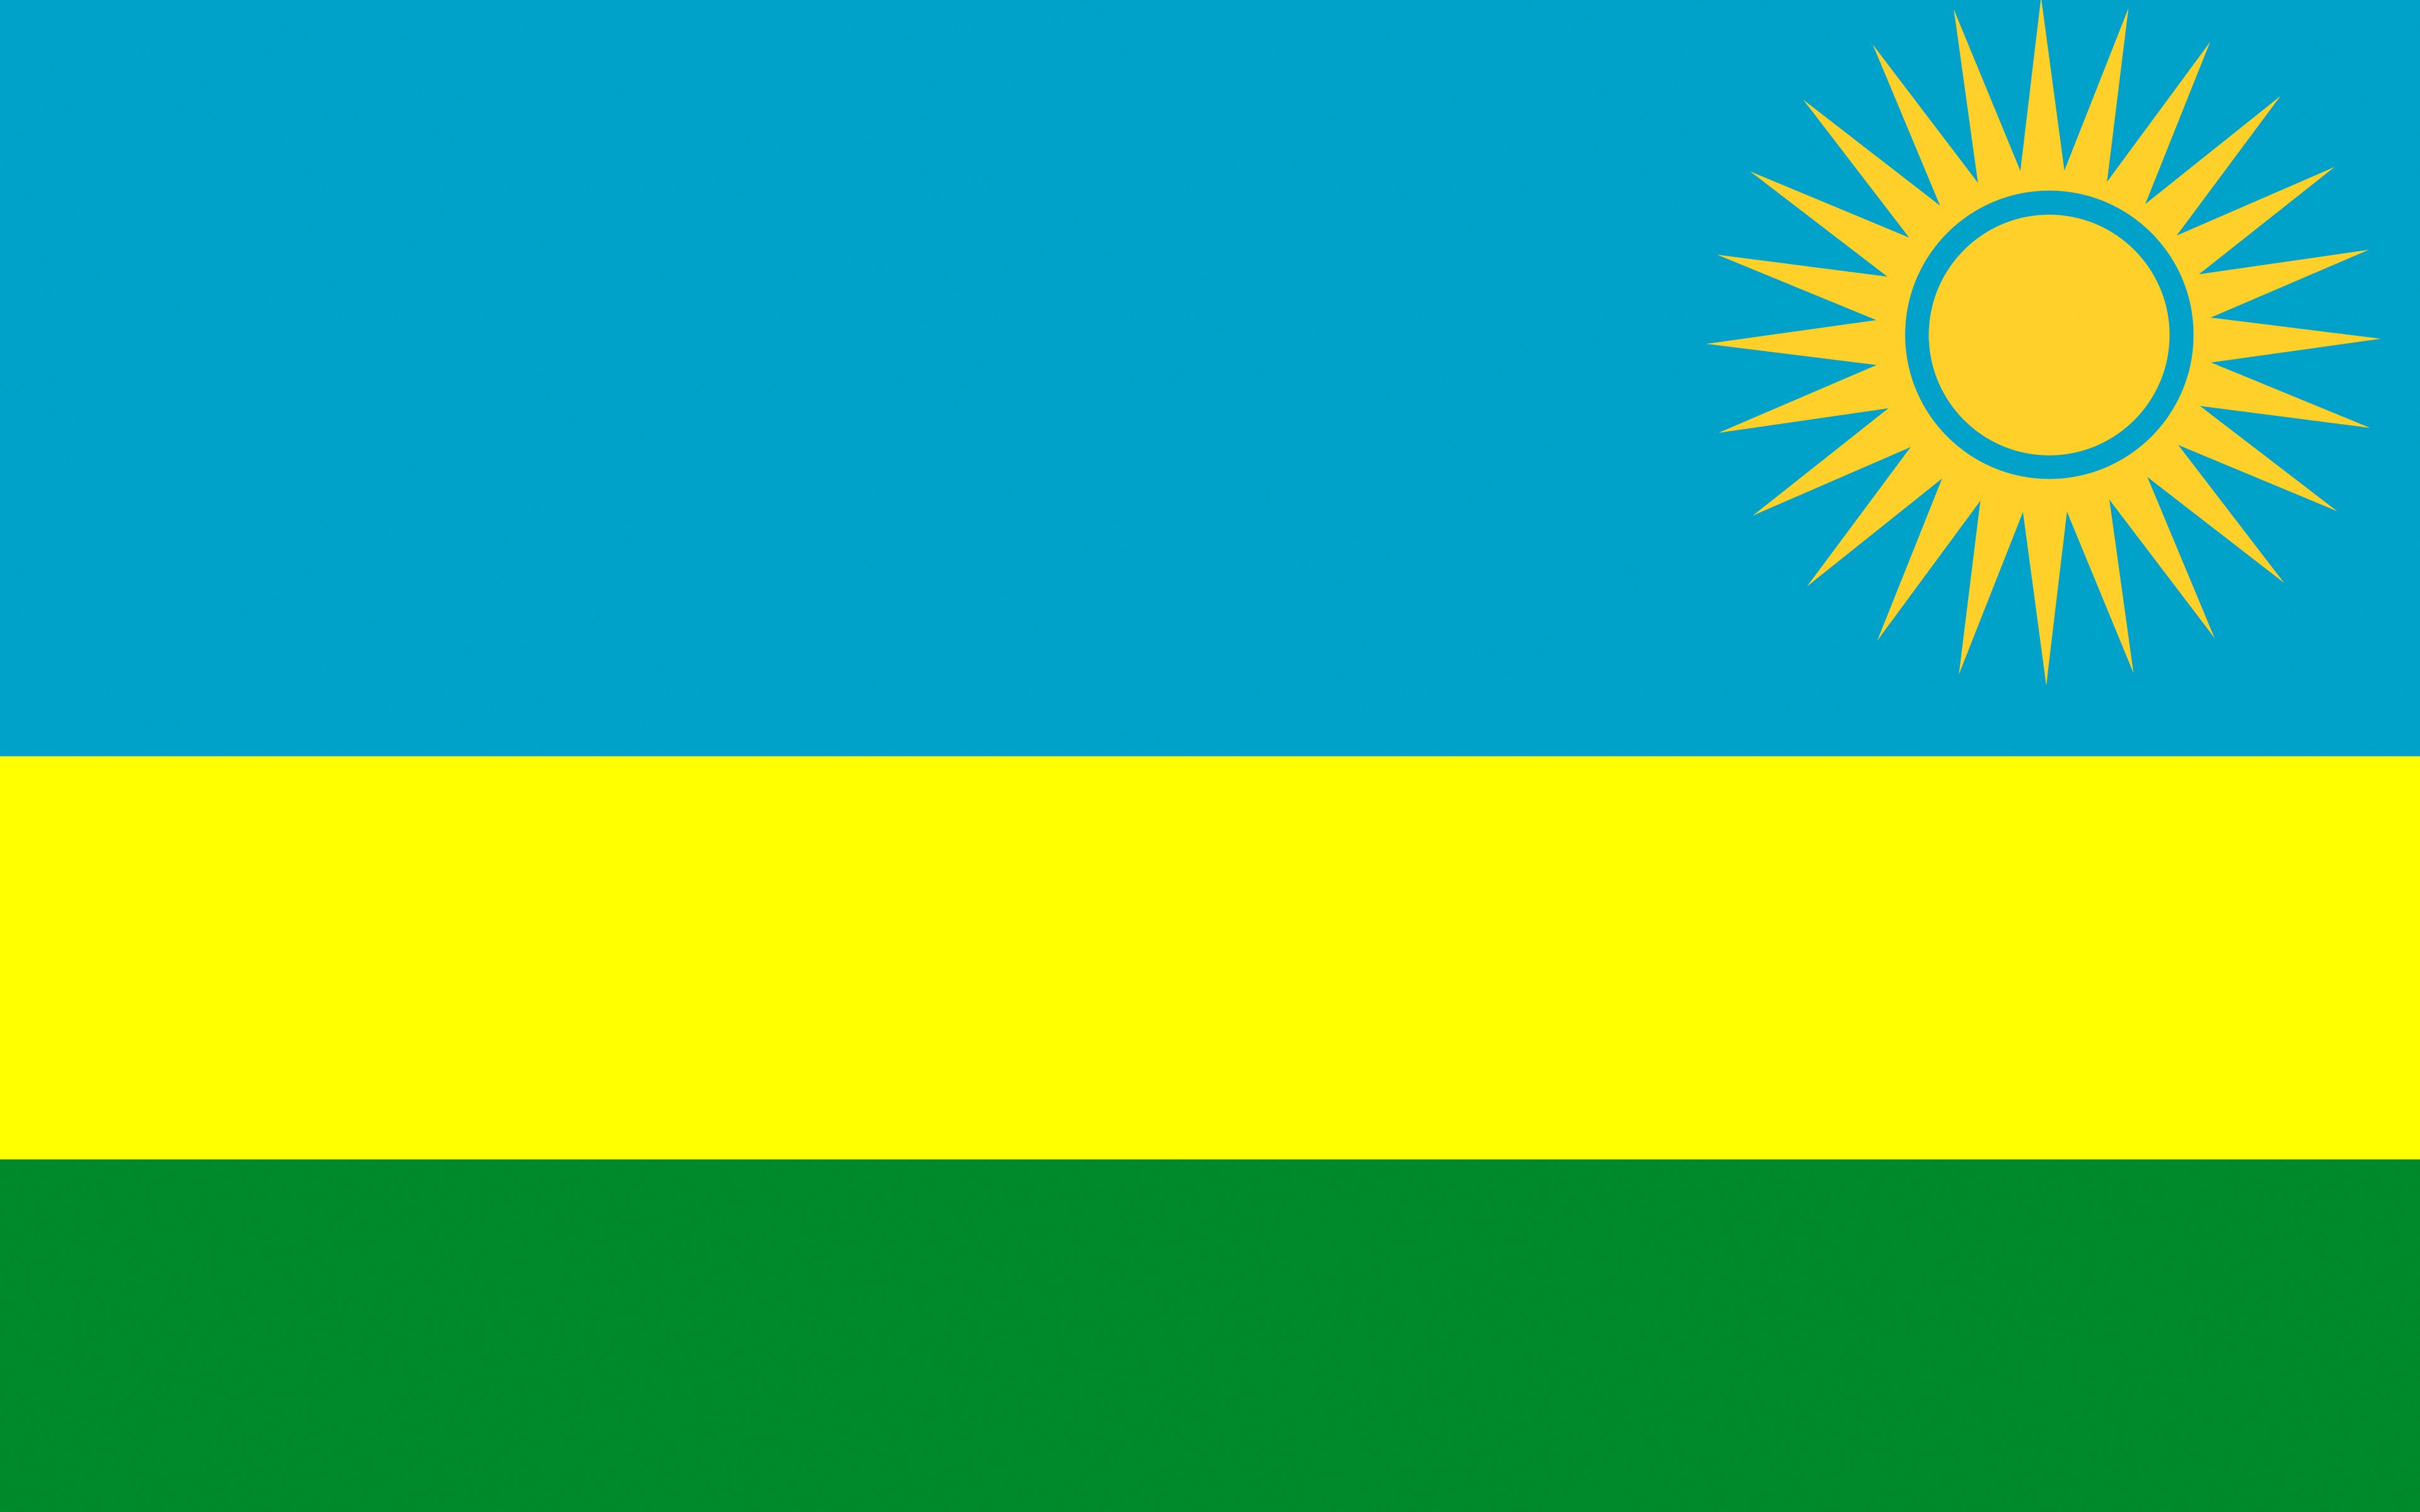 Fondos de Pantalla 3840x2400 Rwanda Bandera Tiras descargar imagenes 3840x2400